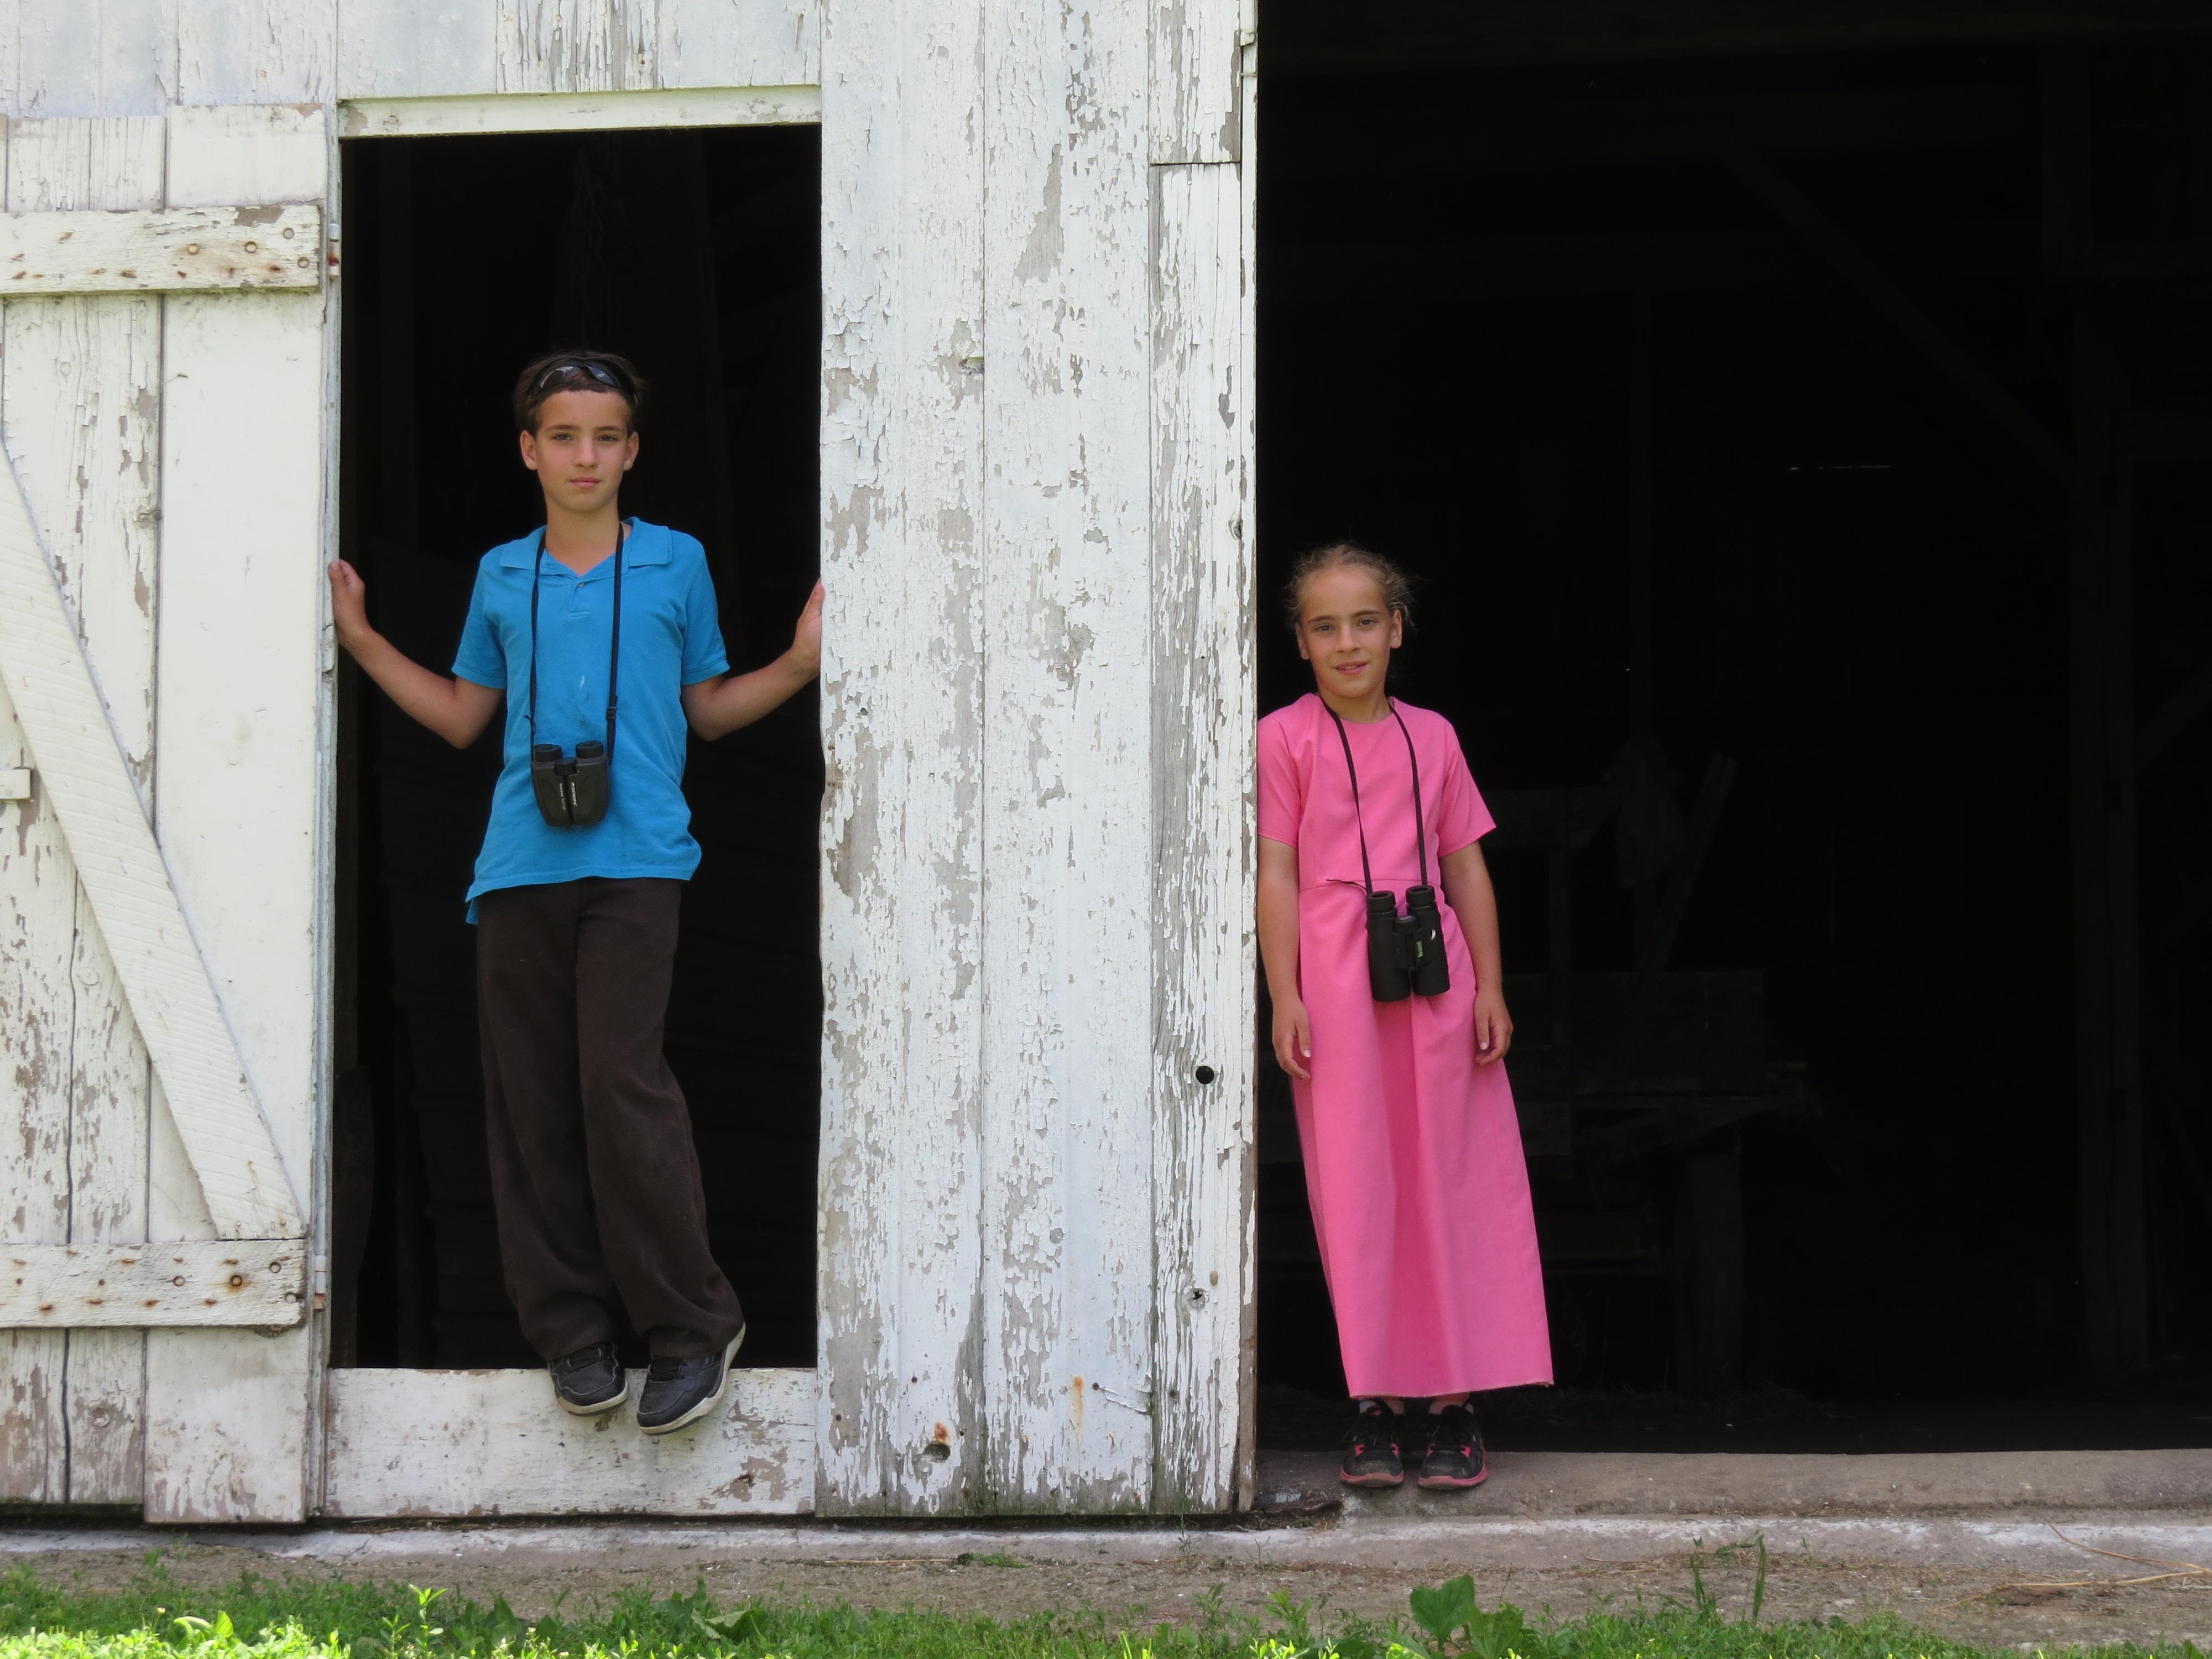 Amish boy and girl,